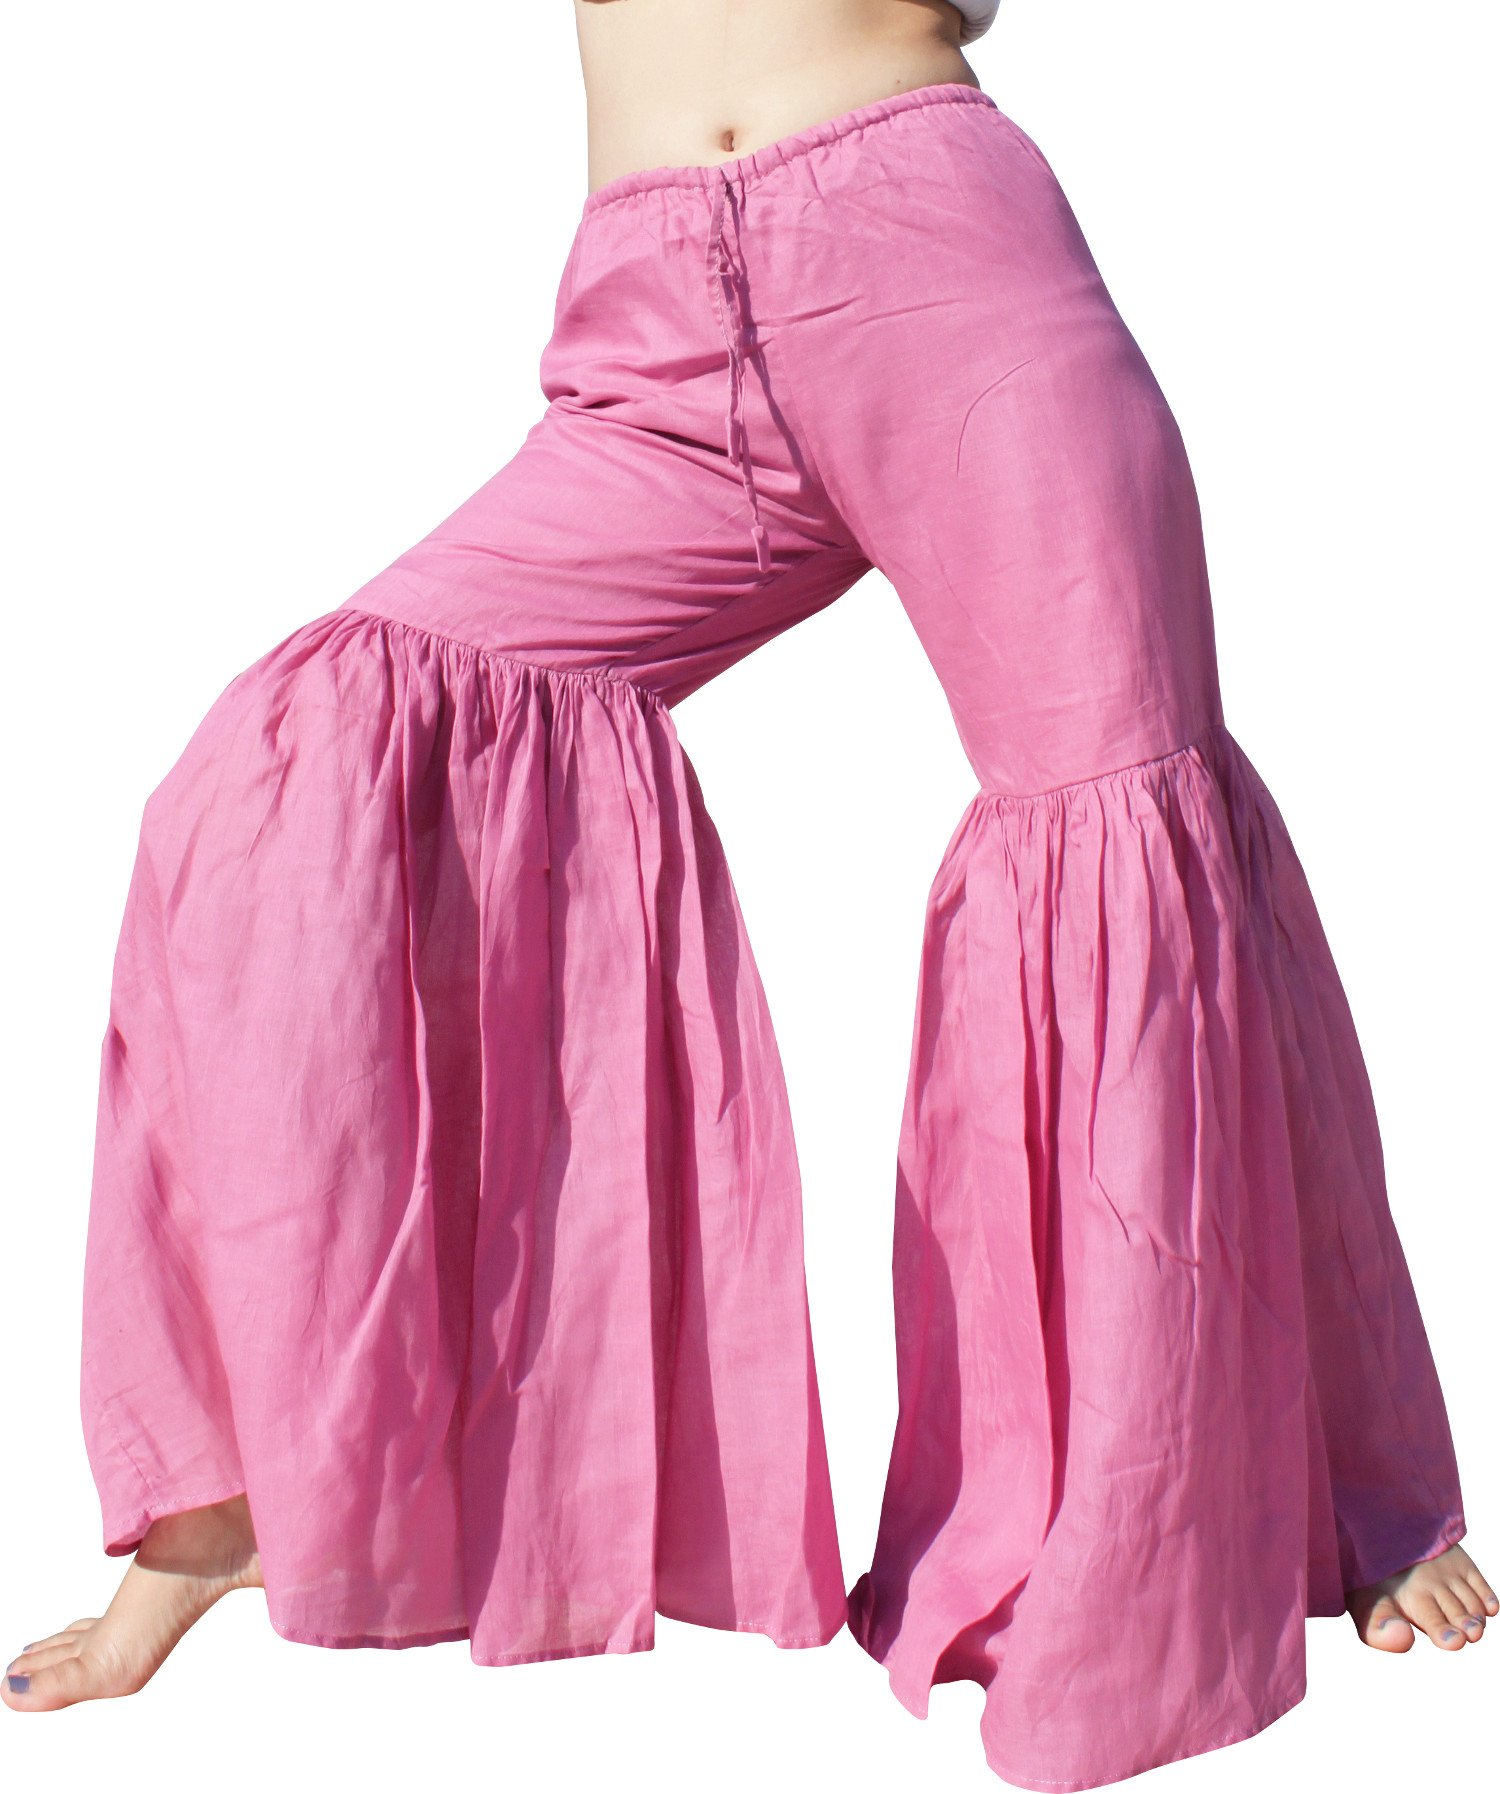 RaanPahMuang Brand Wide Lower Leg Flared Light Cotton Stepped Pants Baggy Cut, Medium, Mauve Pink by Raan Pah Muang